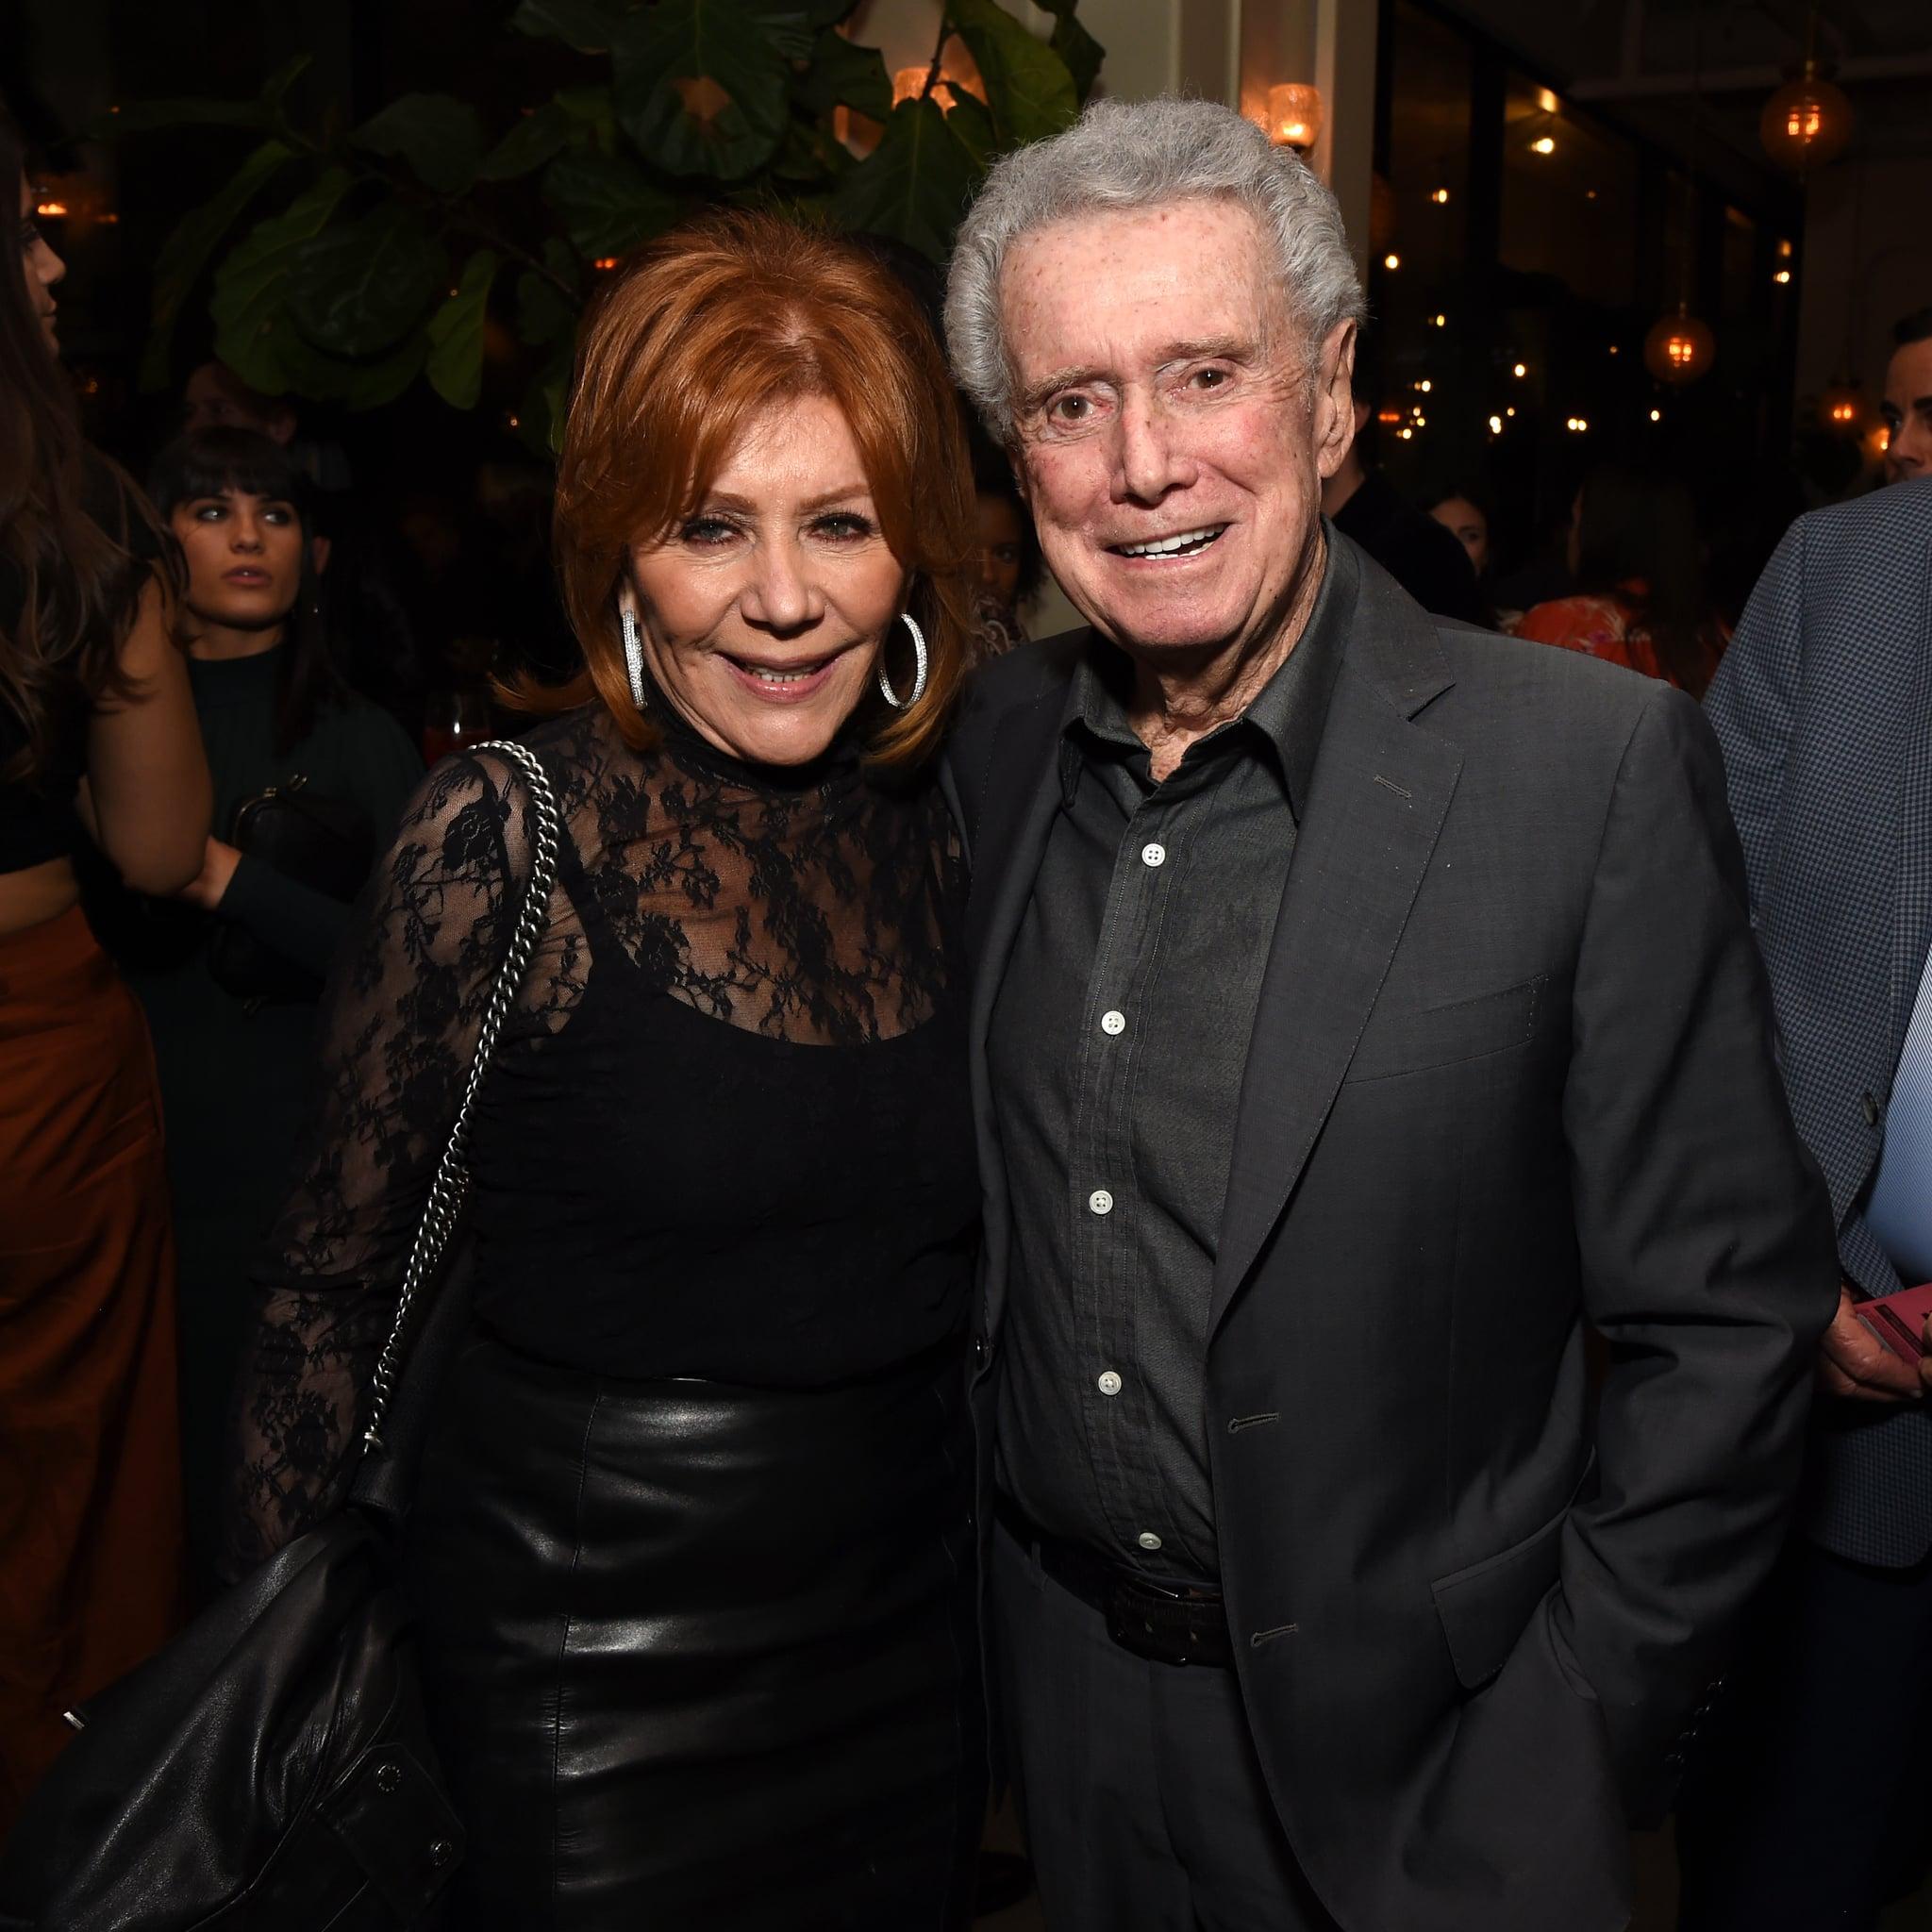 LOS ANGELES, CALIFORNIA - FEBRUARY 27: (L-R) Joy Philbin and Regis Philbin attend the LA screening of